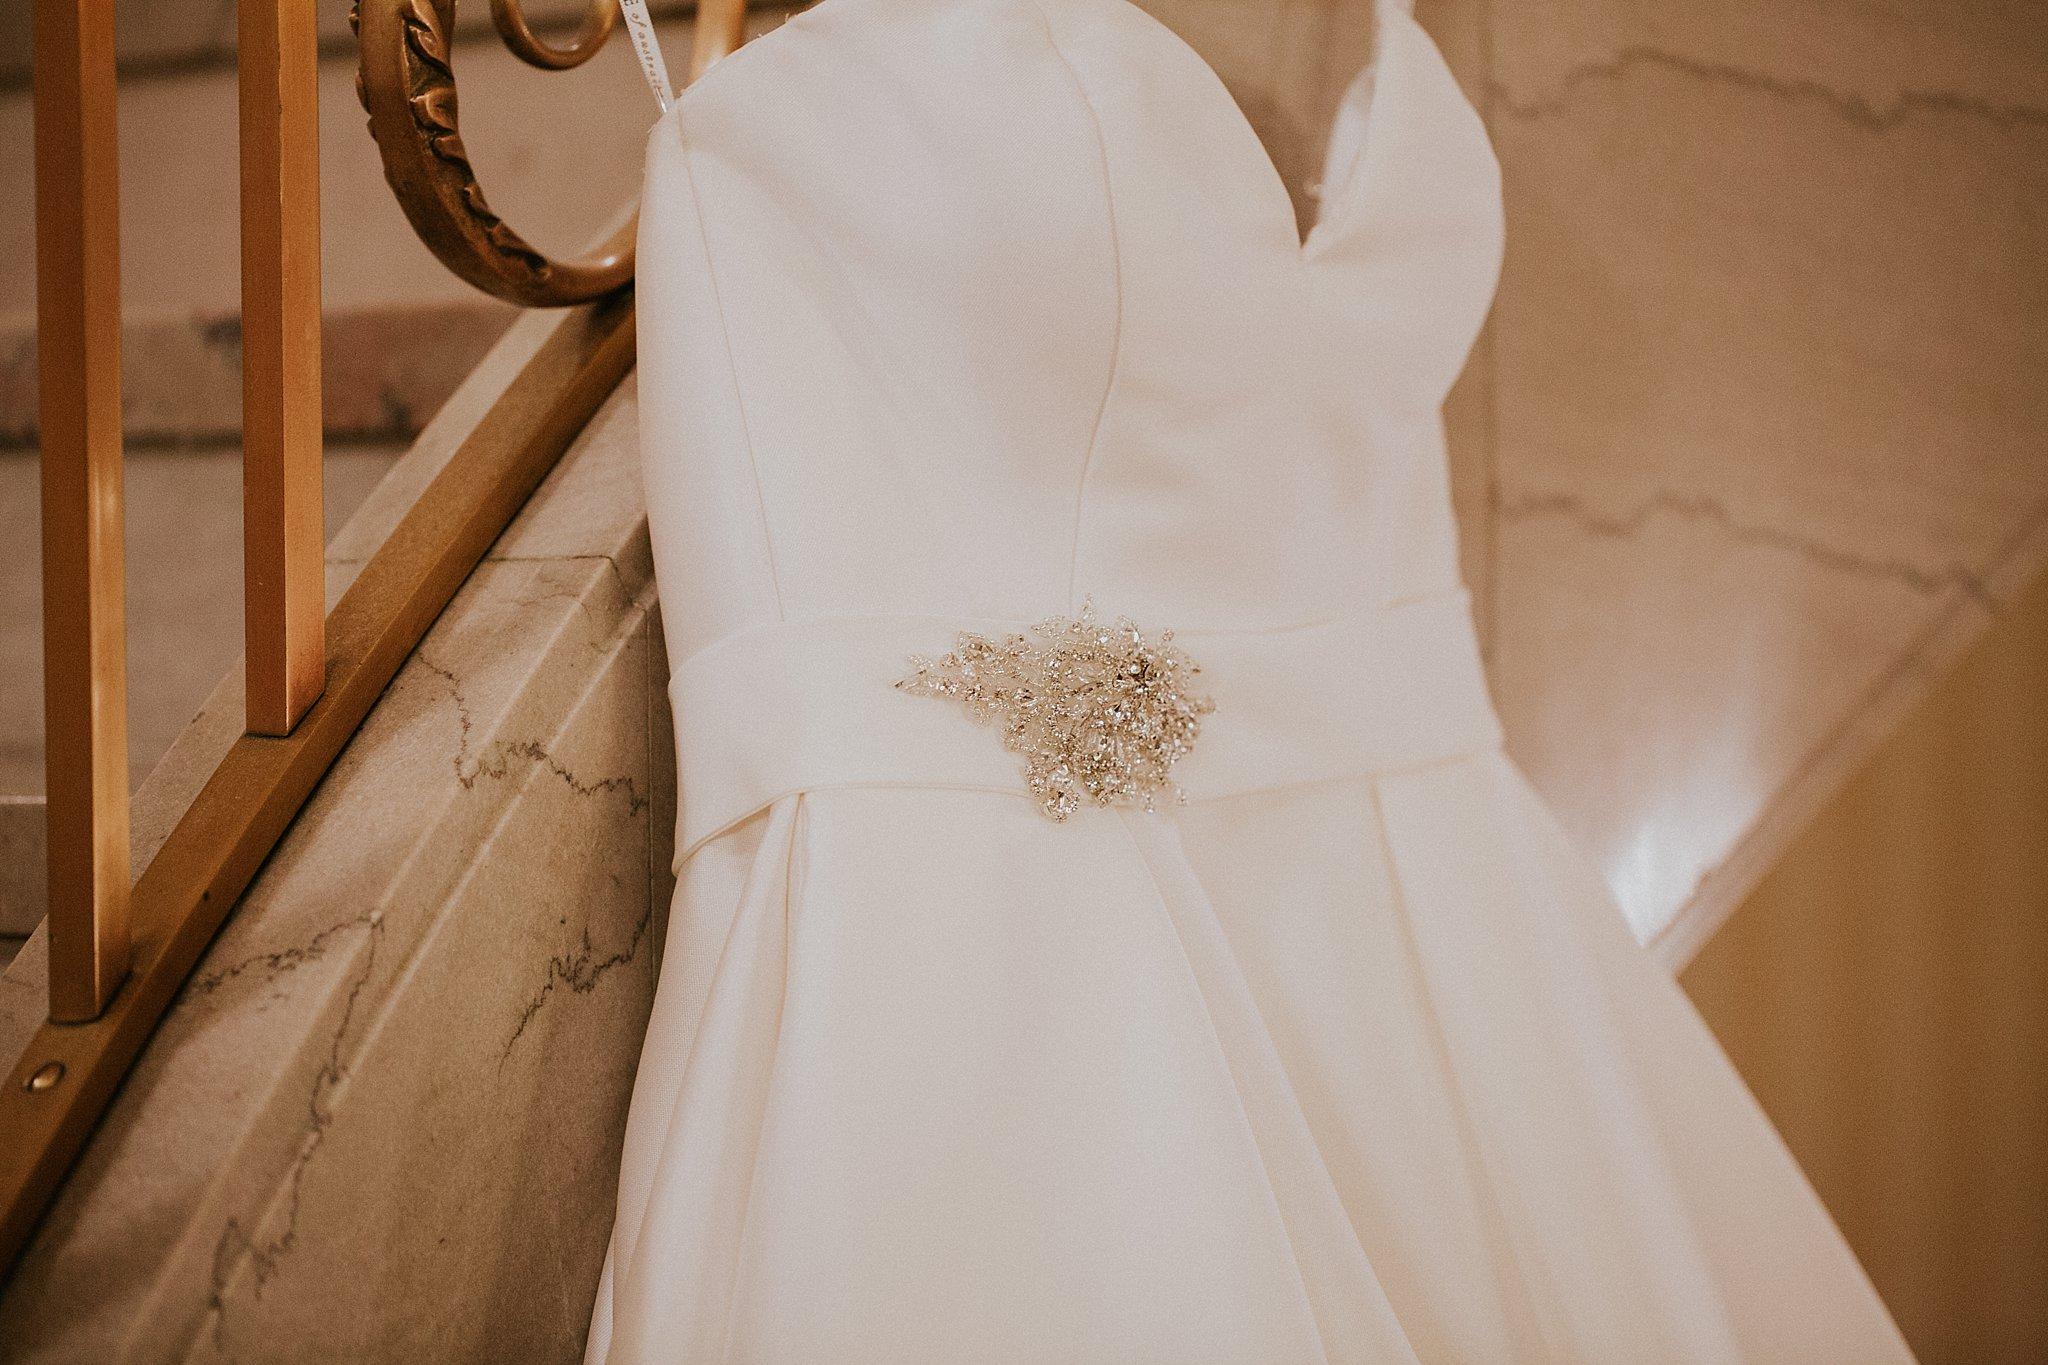 Matt-Lauren_St-Marys_Hilton-City-Center-Milwaukee-Wedding_liller-photo_0005.jpg